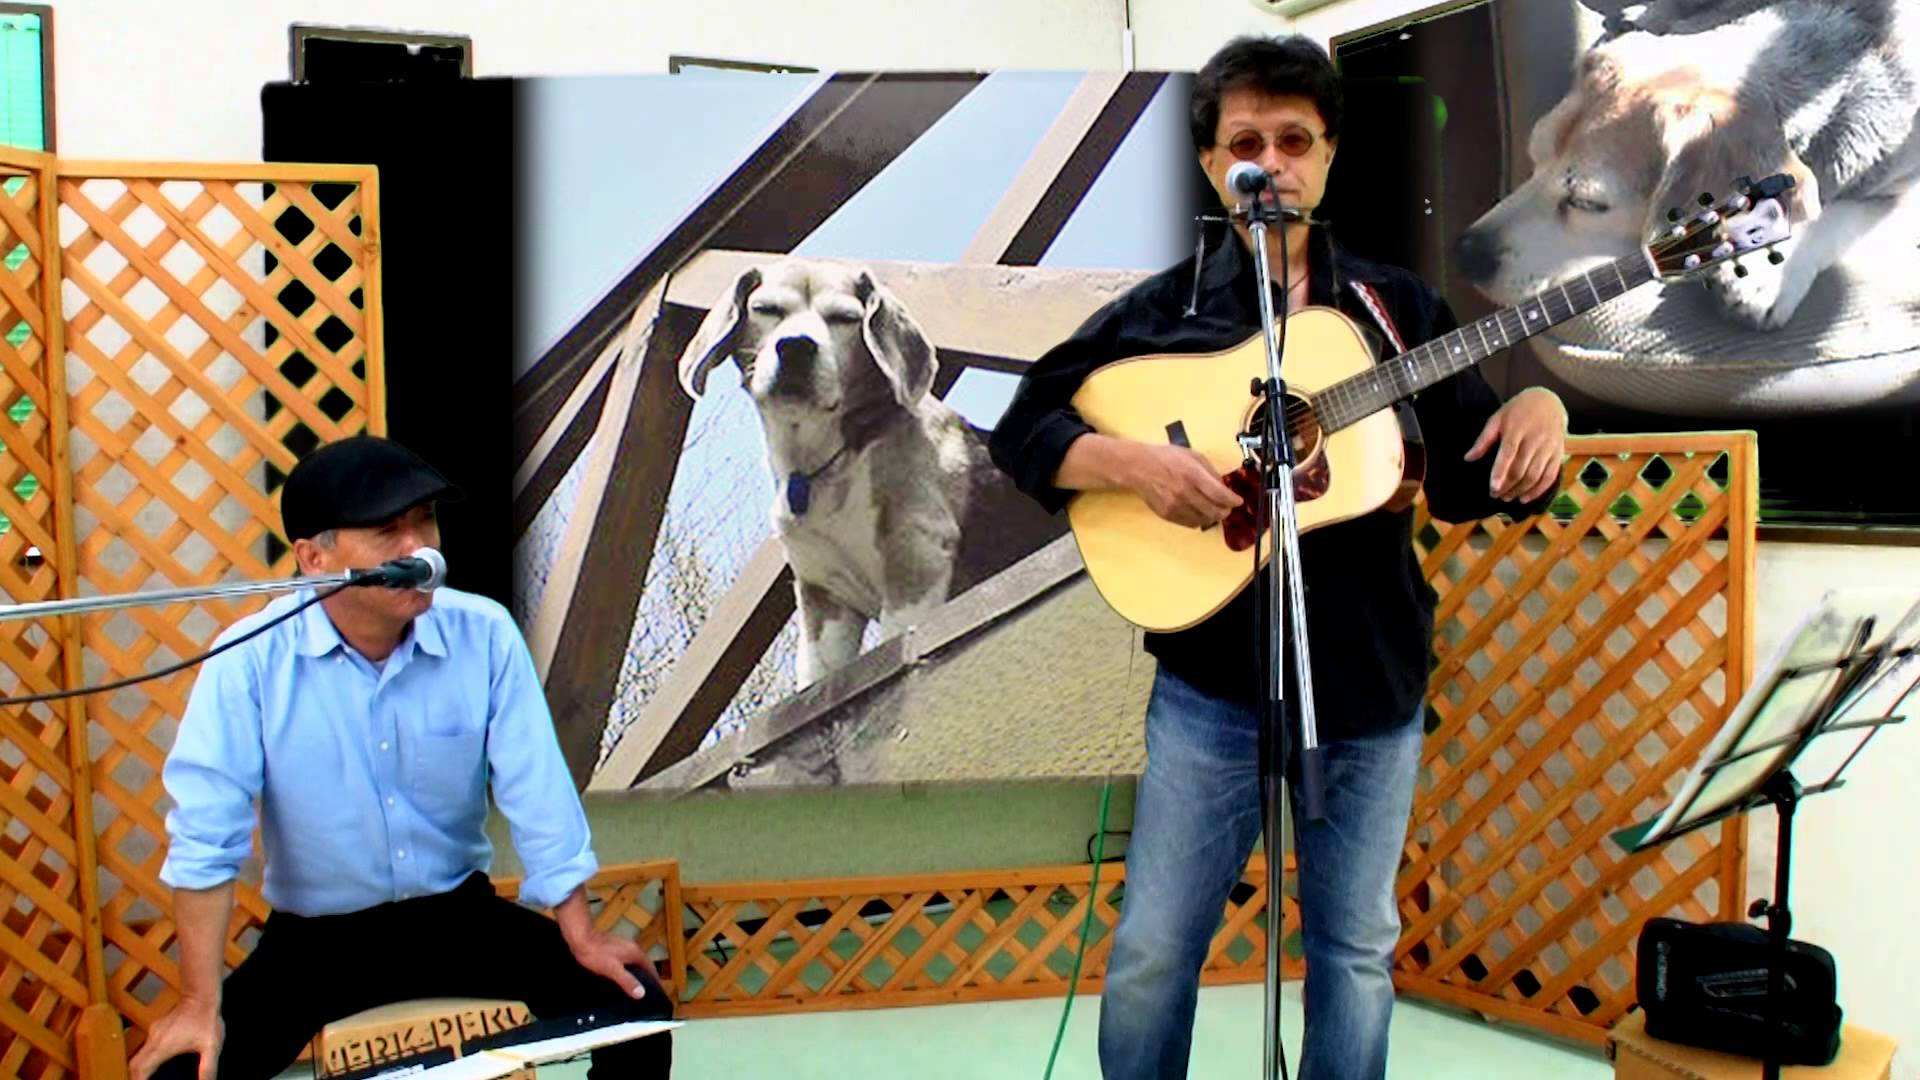 K介のSongs&Dogs週末はミュージシャン68